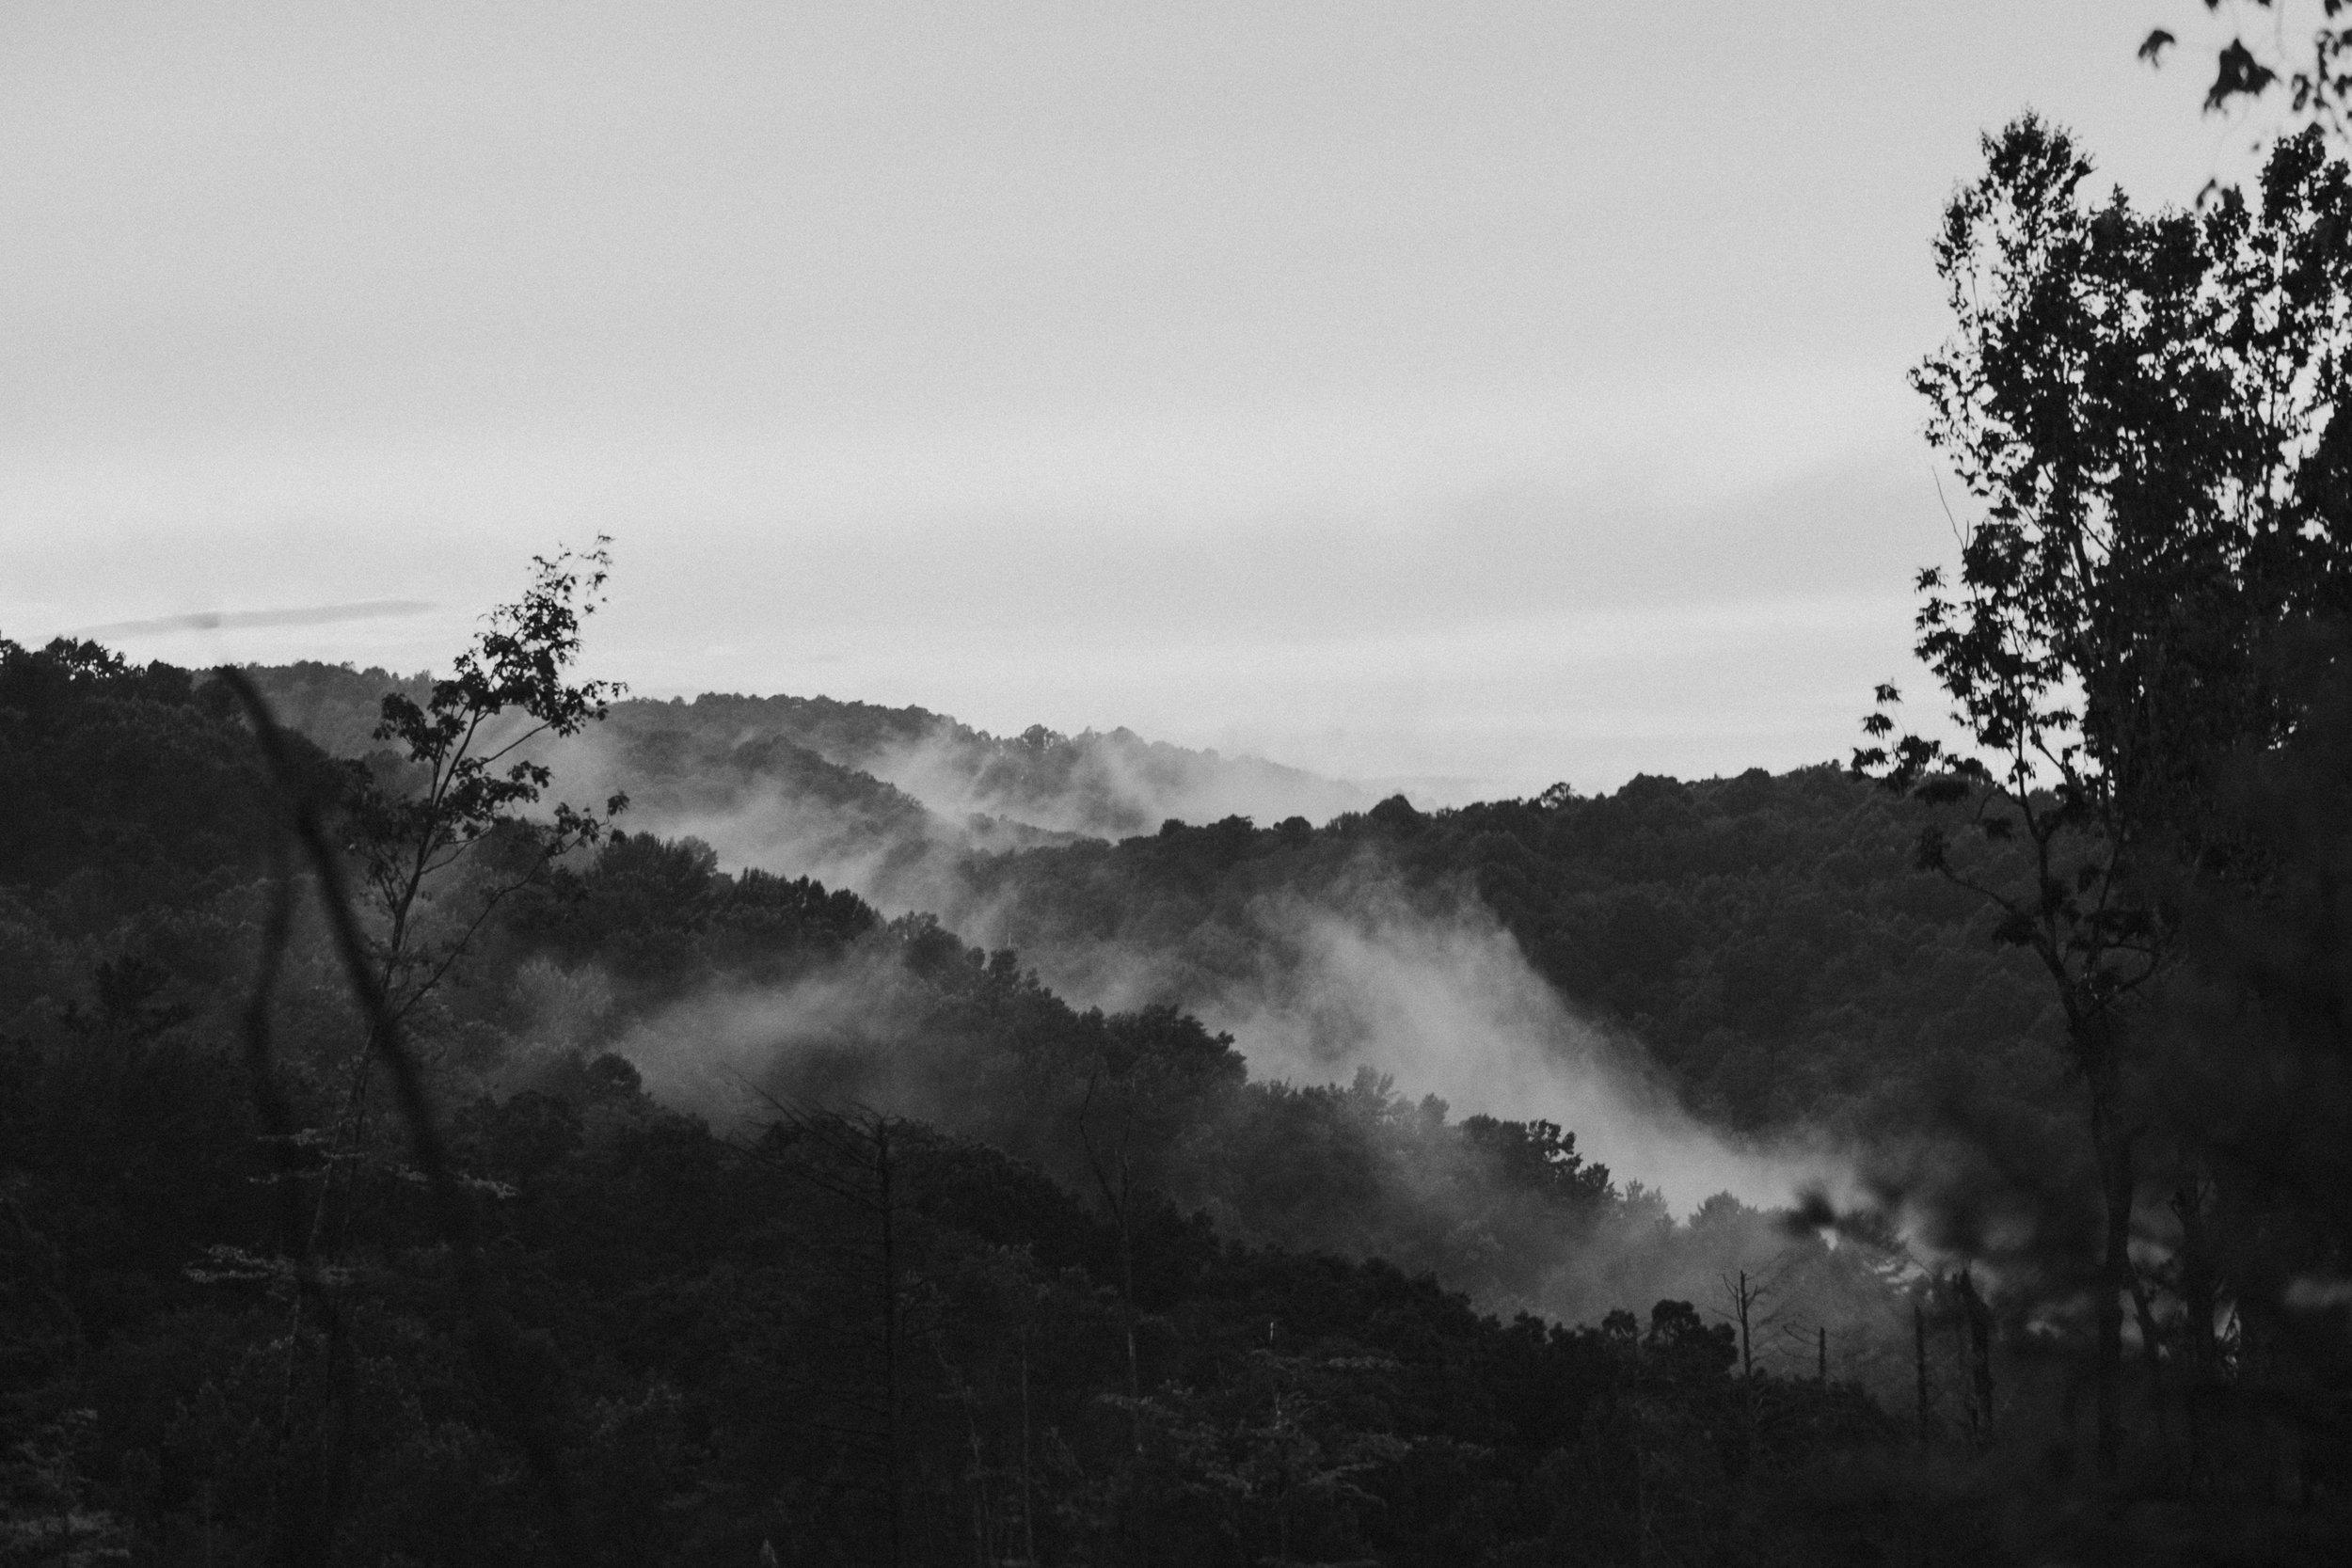 bw- fog in the trees - getoutside -adventurealliance